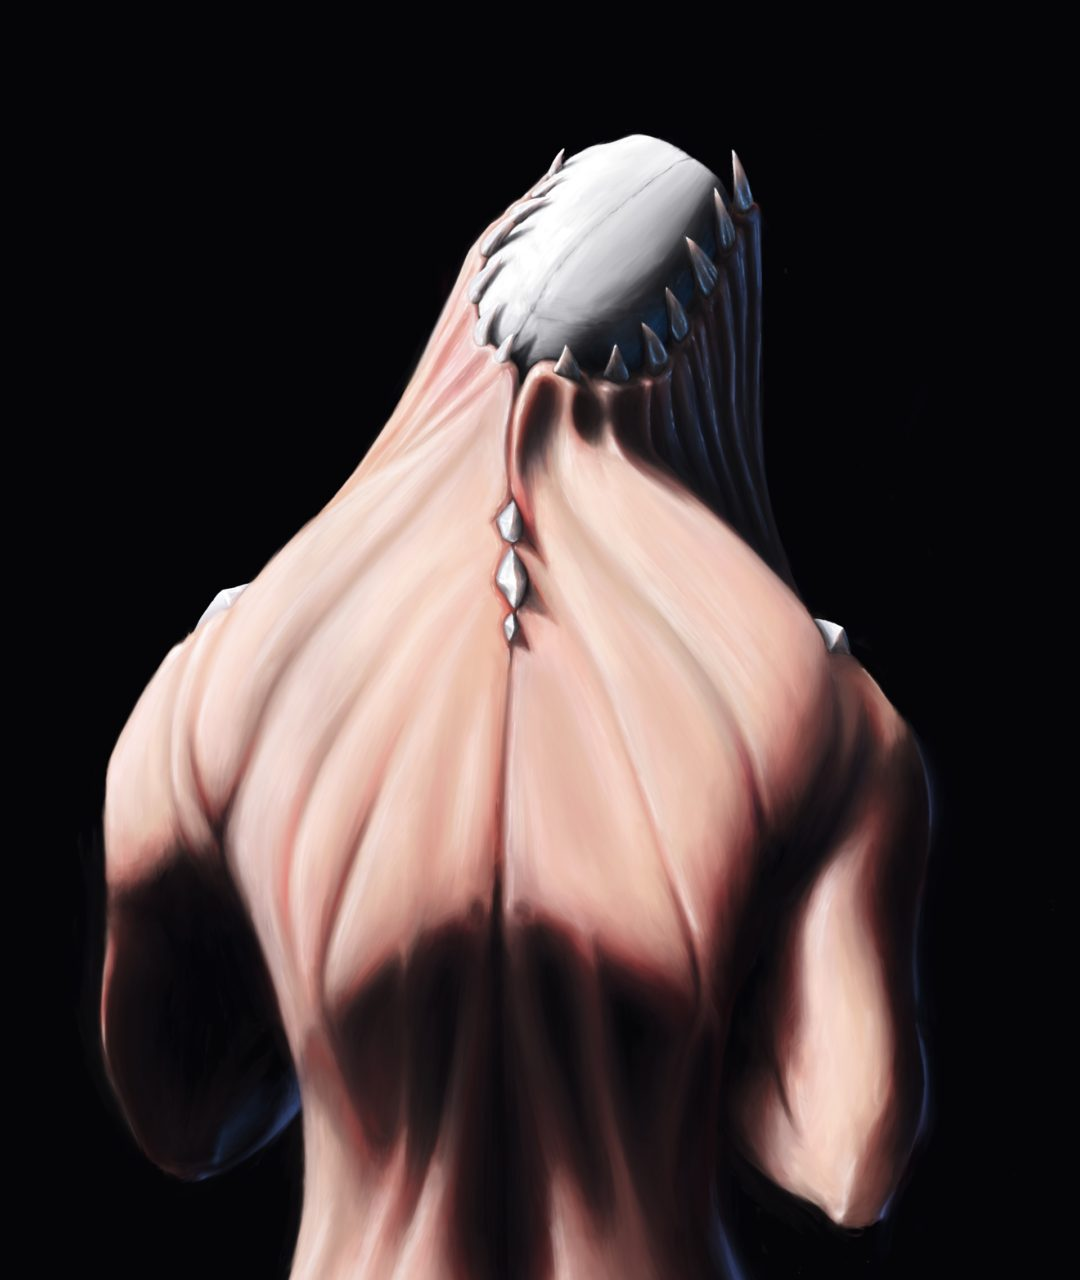 darck creature, concept art